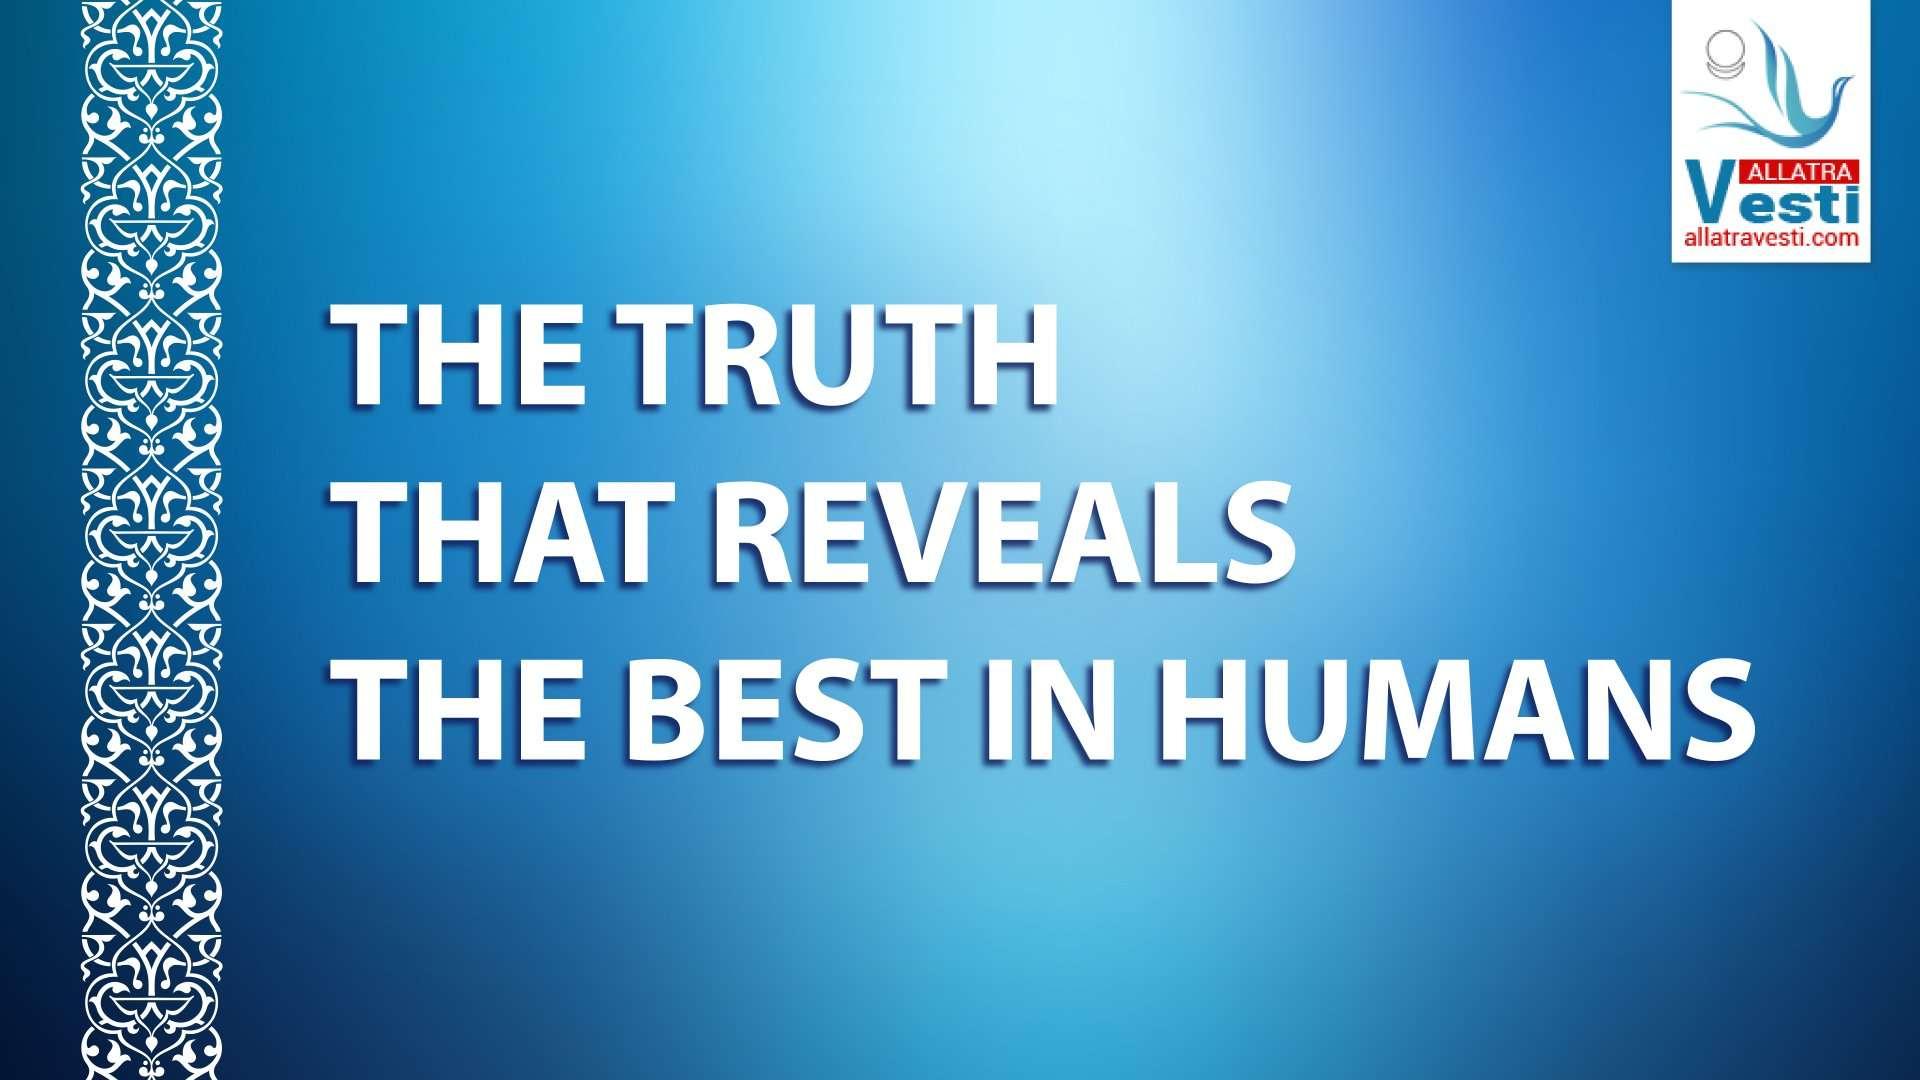 <mark><b>The</b></mark>   <mark><b>truth</b></mark>  that reveals  <mark><b>the</b></mark>  best in humans